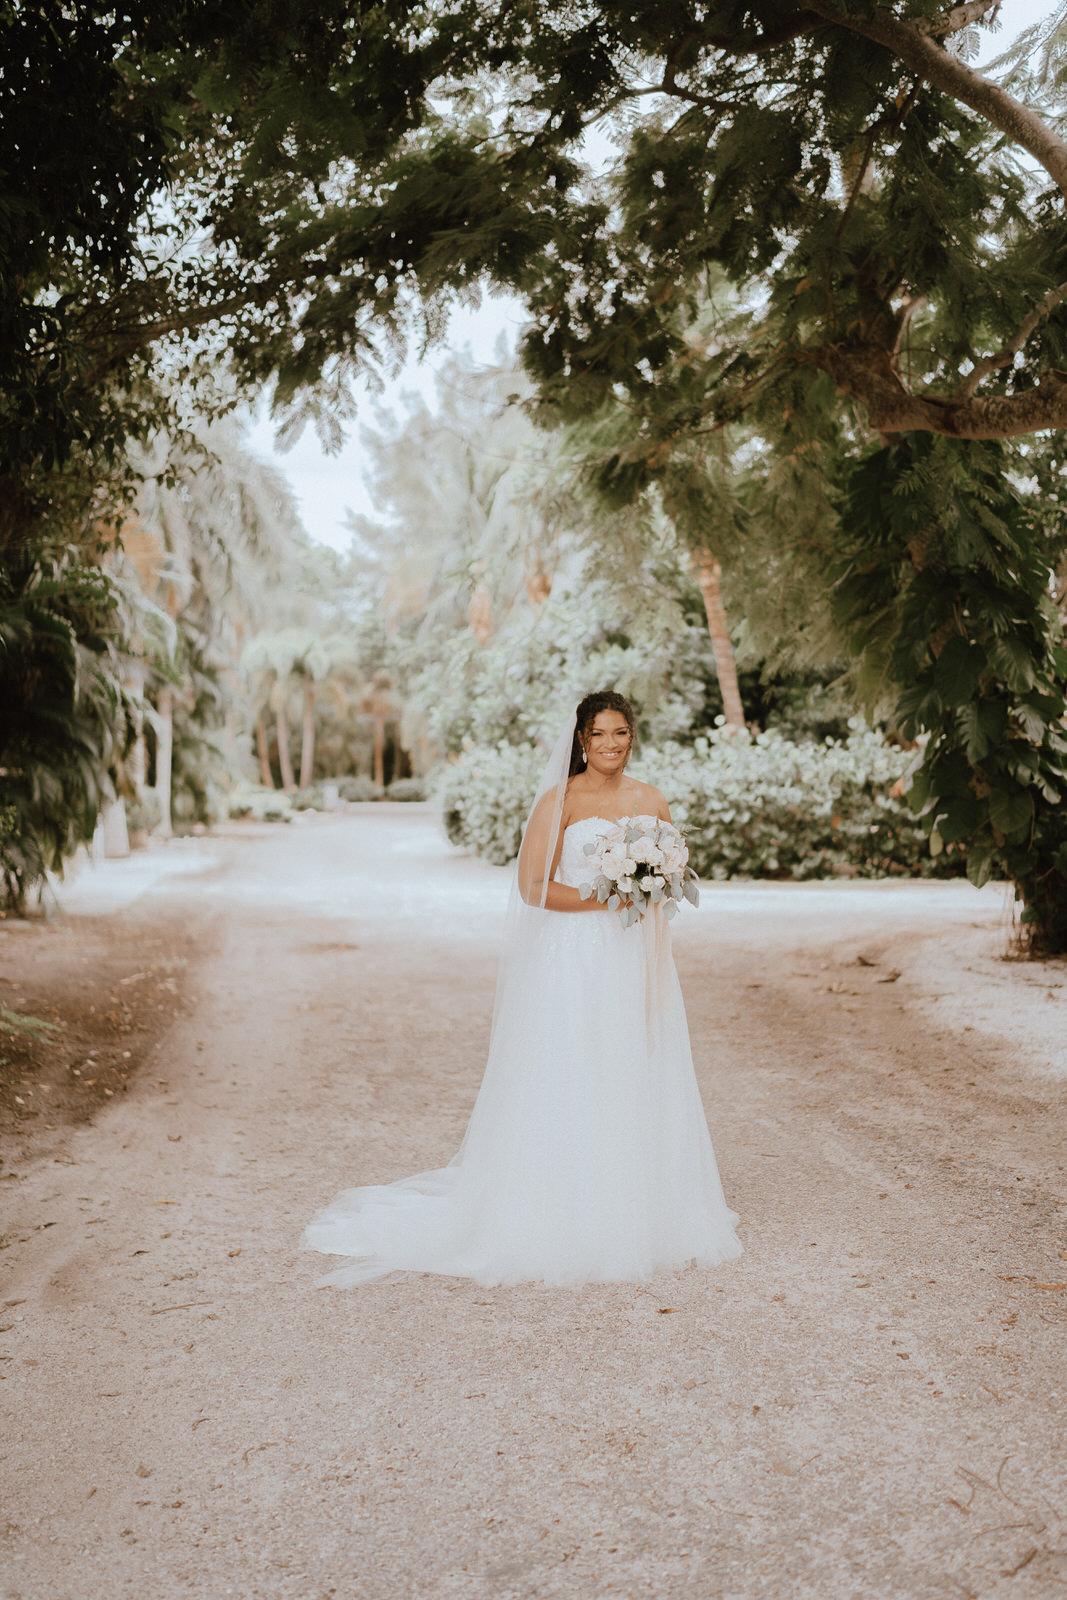 South Seas Island Resort Elopement- Alyana and Shawn- Michelle Gonzalez Photography-89.JPG